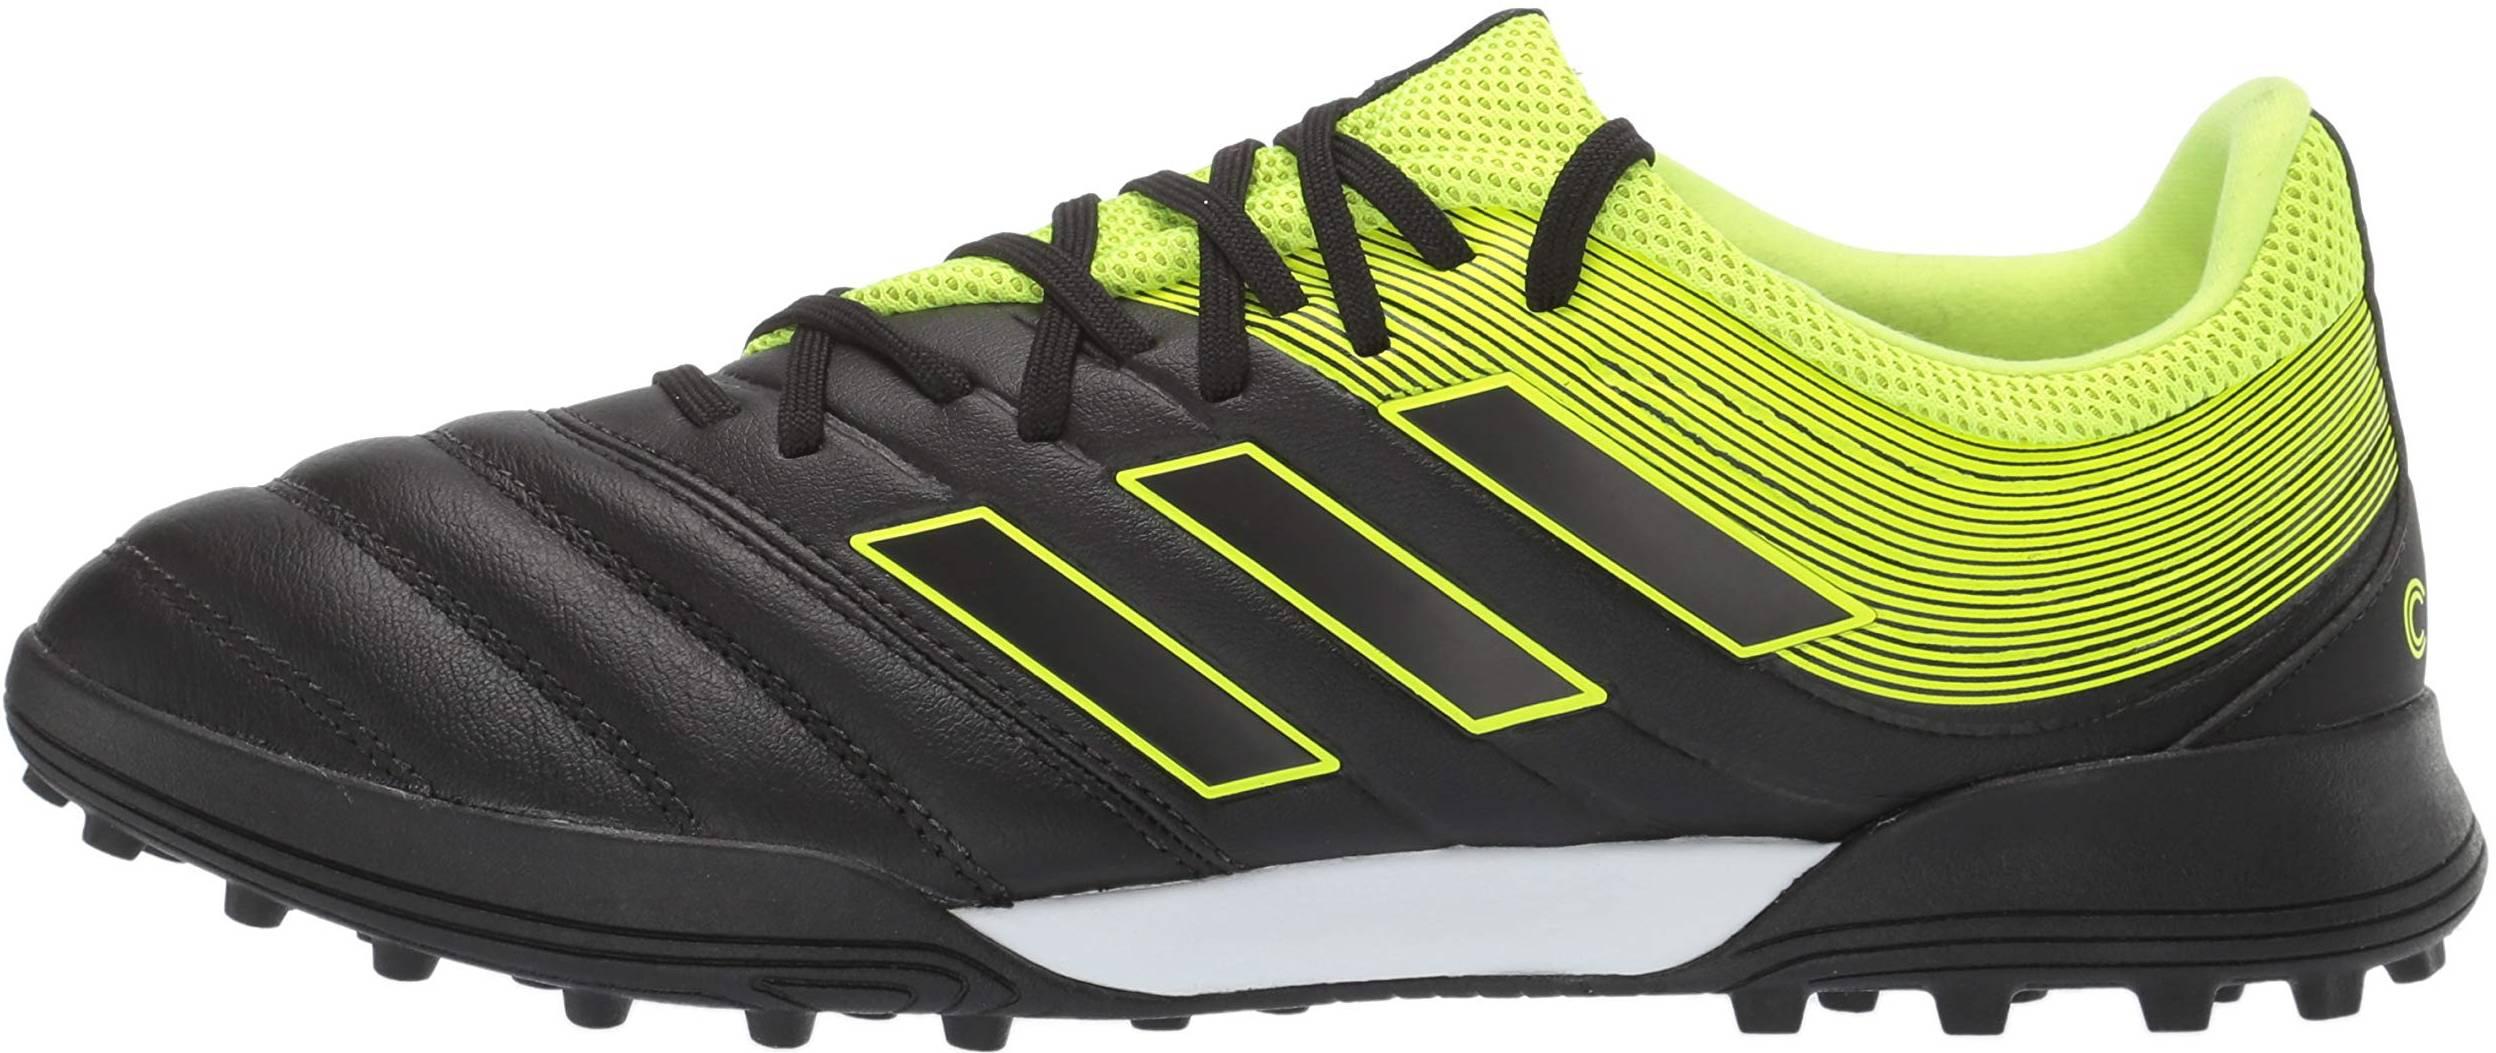 Adidas Copa 19.3 Turf